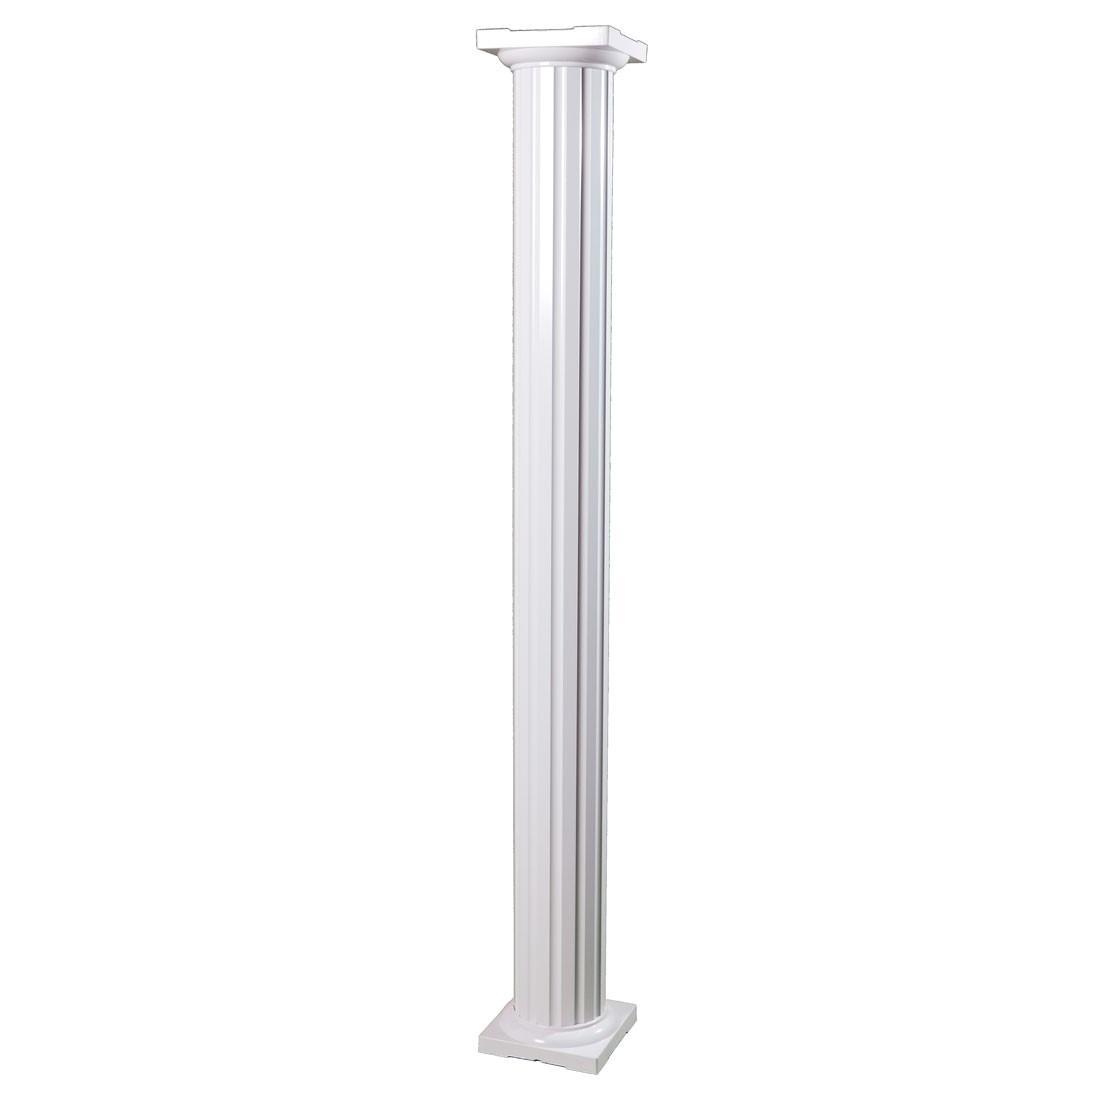 Decorative Metal Column Wraps Buy Round Fluted Aluminum Columns Support Columns Wraps